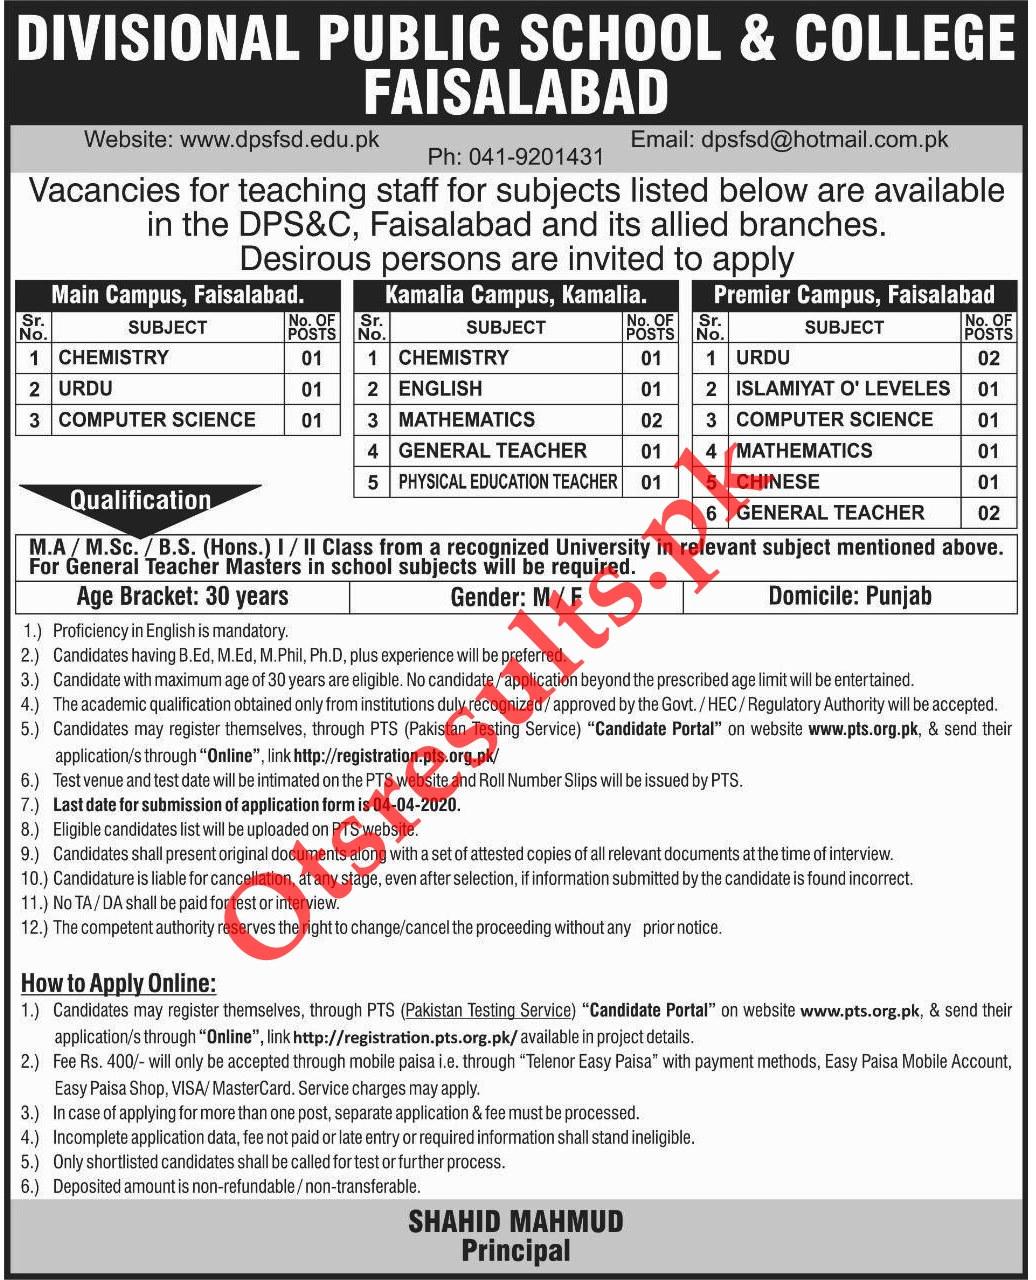 Divisional Public School & College Faisalabad PTS Jobs 2021 Application Form Roll No Slip